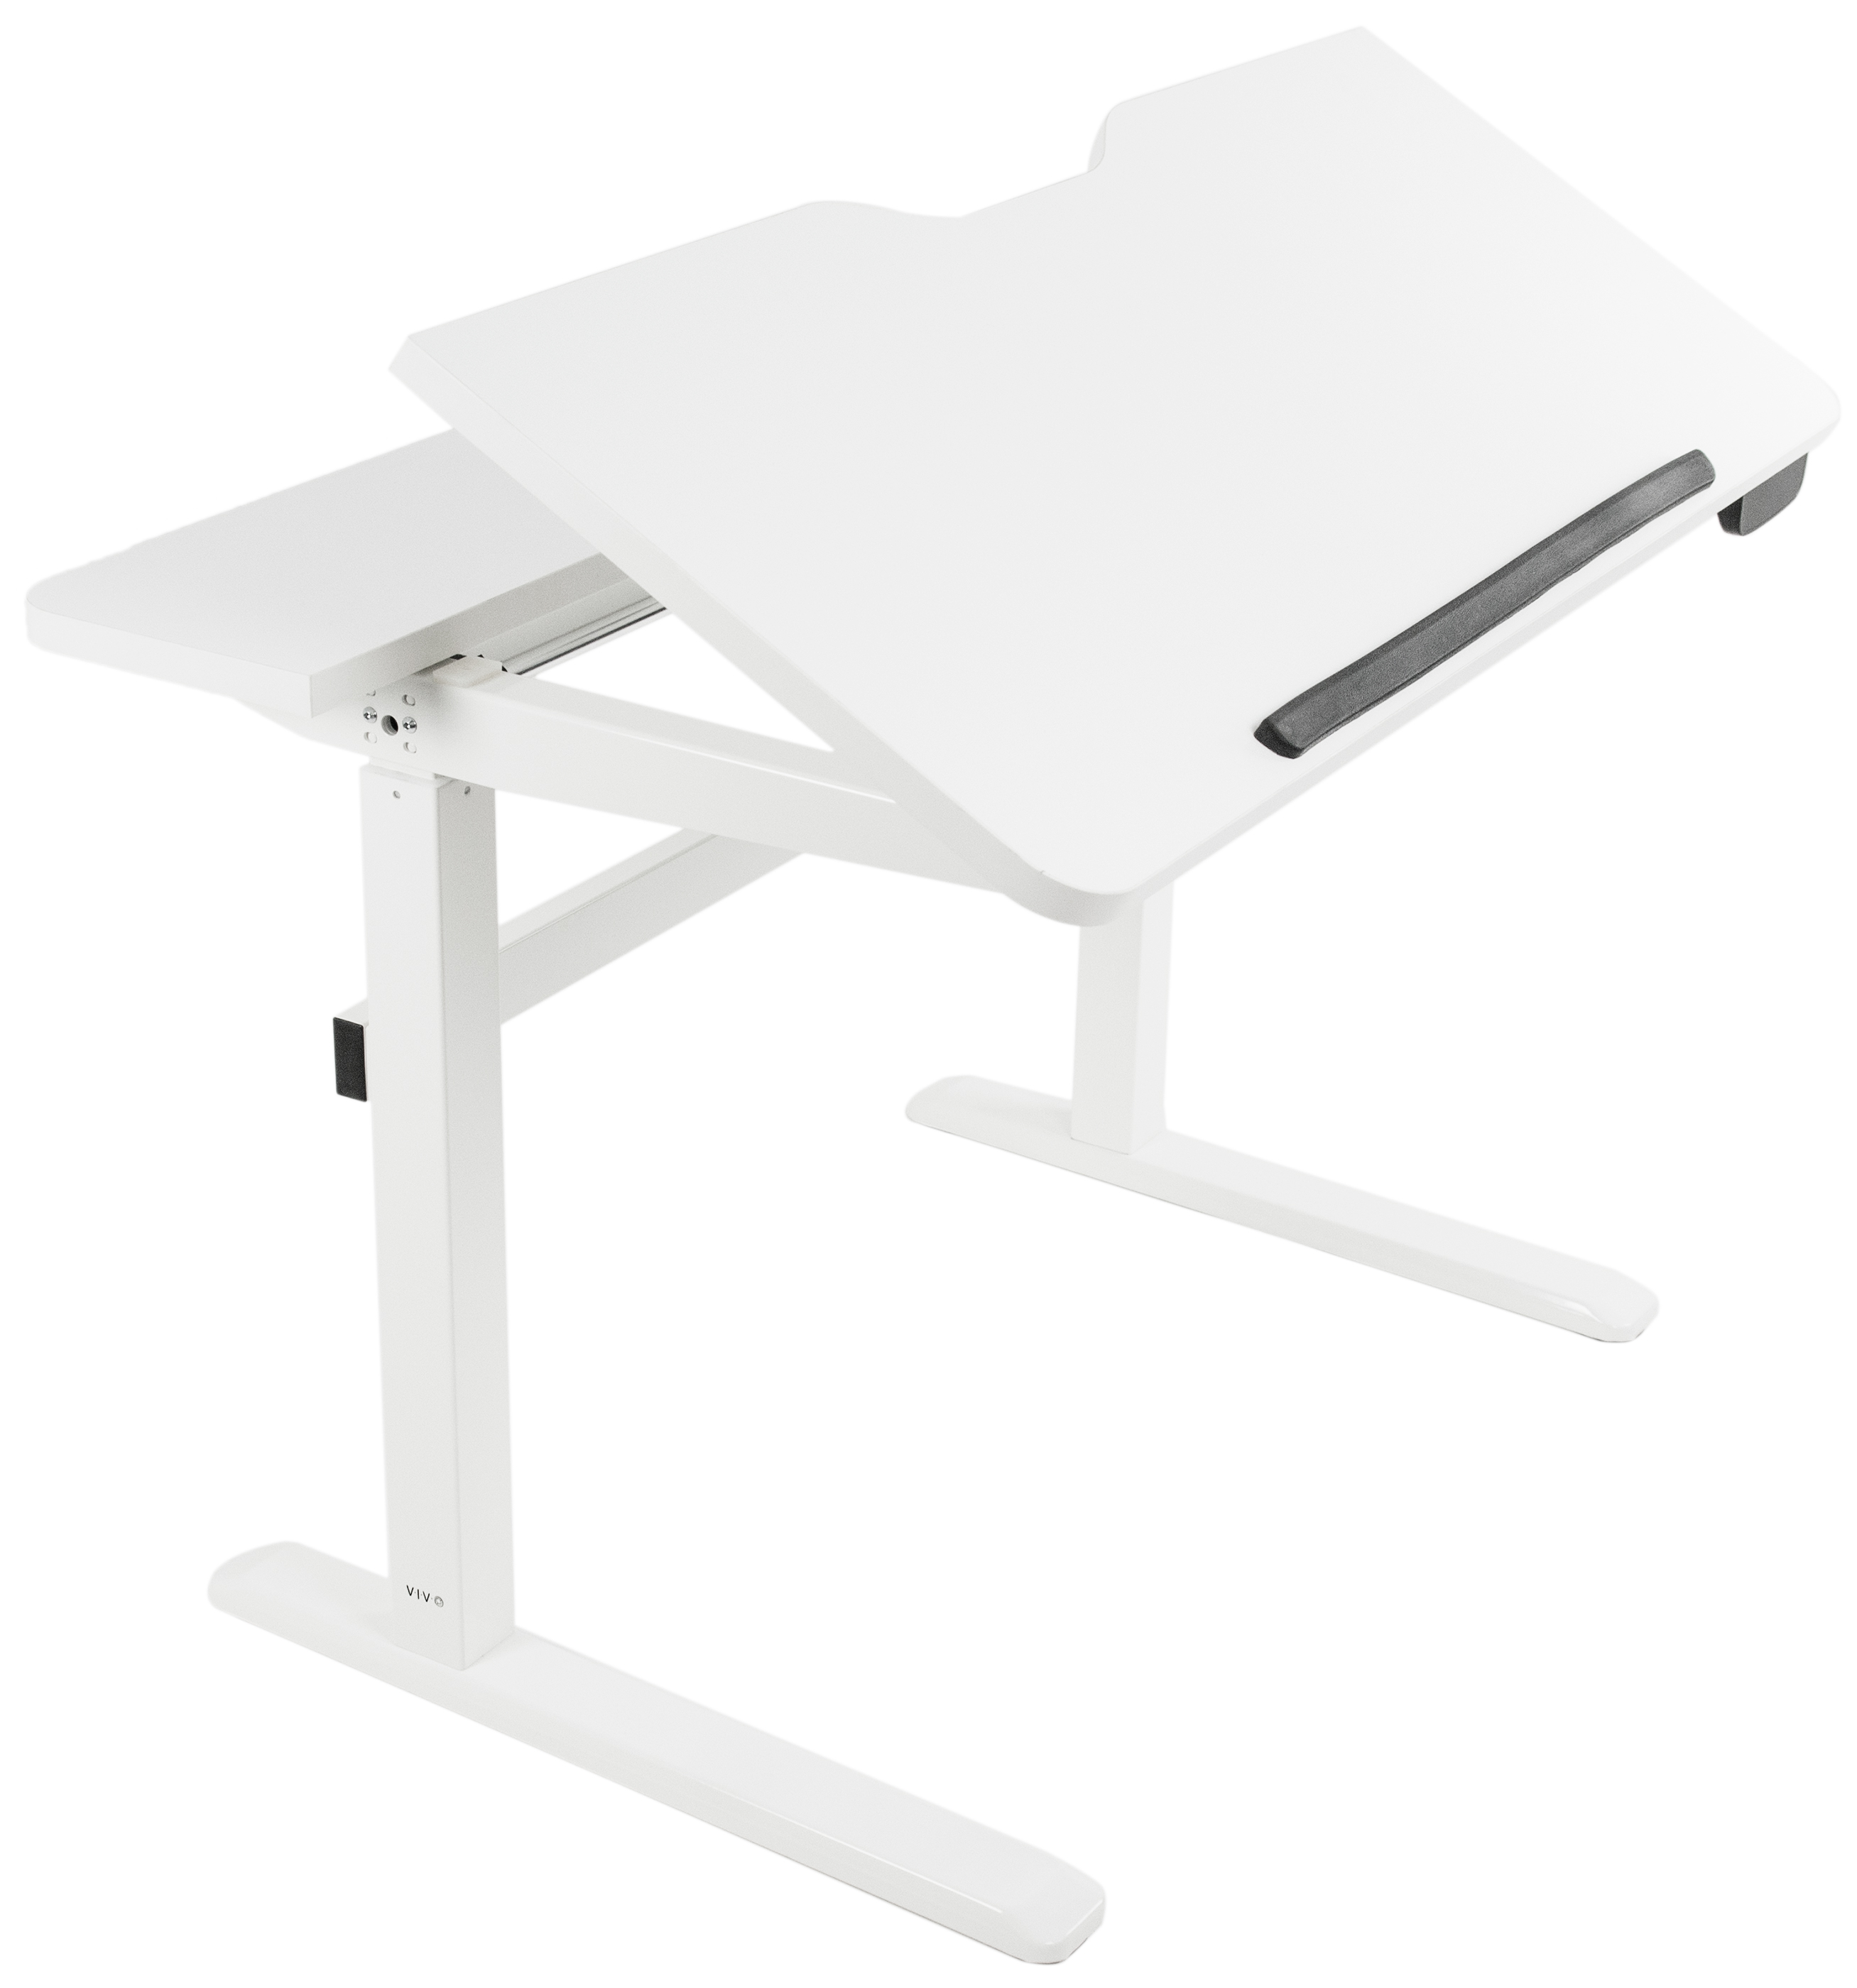 "VIVO White Height Adjustable Electric Motor Sit Stand 48"" x 29"" Drafting Desk | 30 Degree Tilting Desktop (DESK-V101ED)"